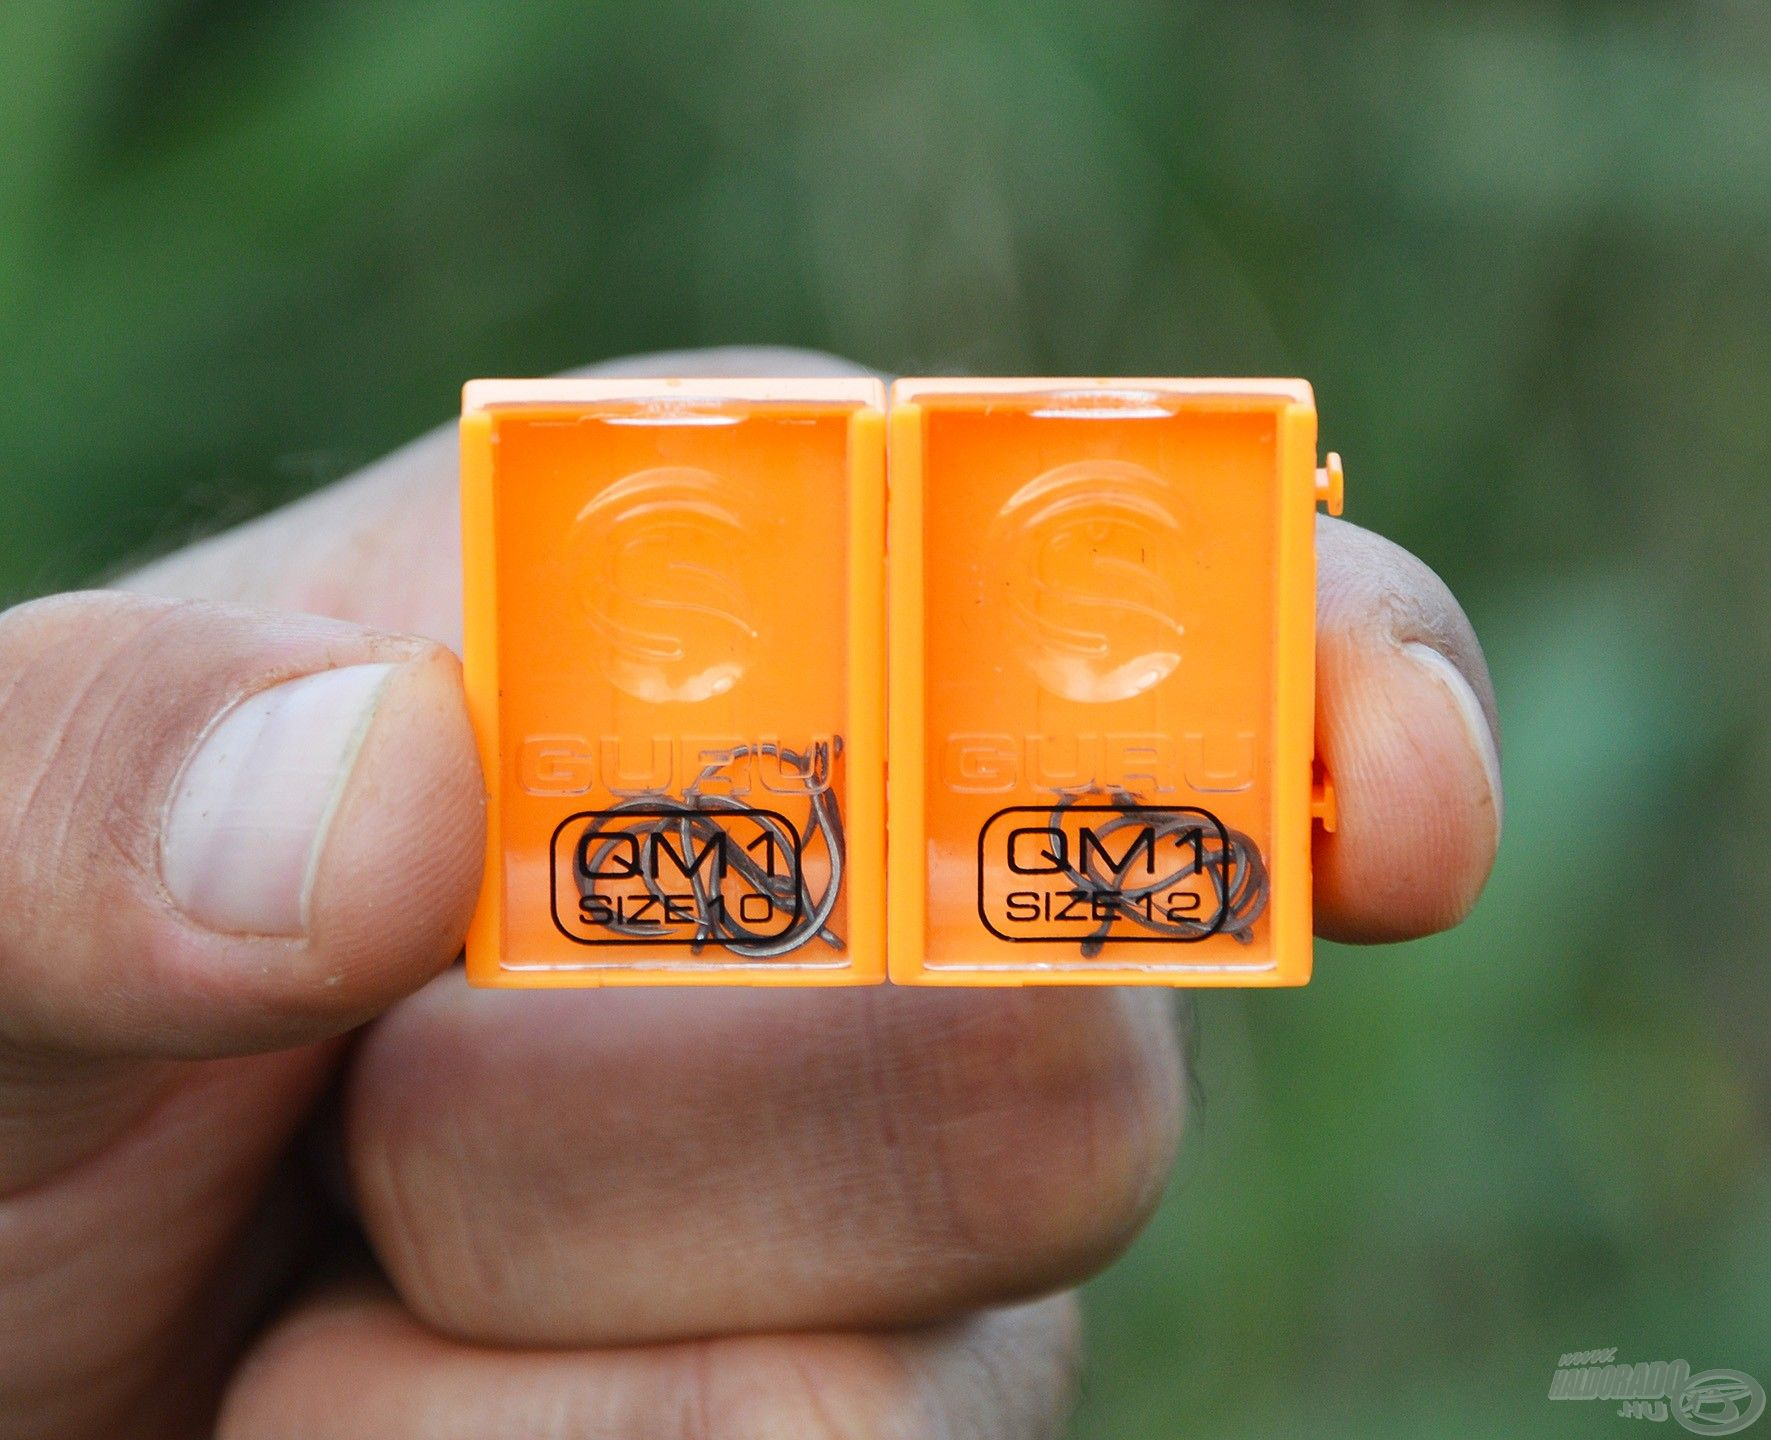 A Guru QM1 jól bevált hideg vízi horog